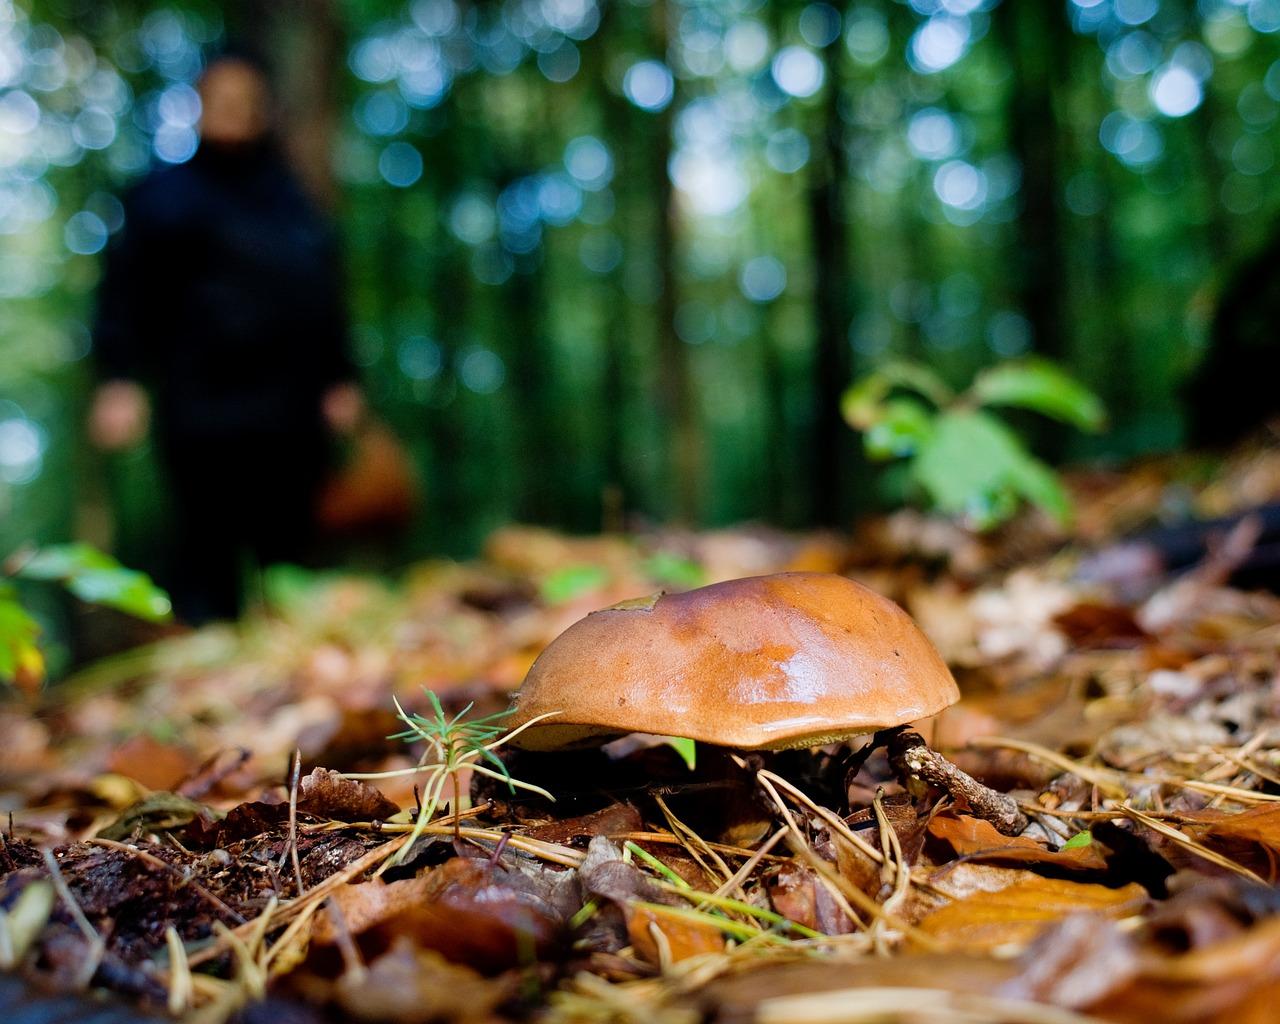 наружной стороны осенний лес с грибами фото слайды форма юбочки